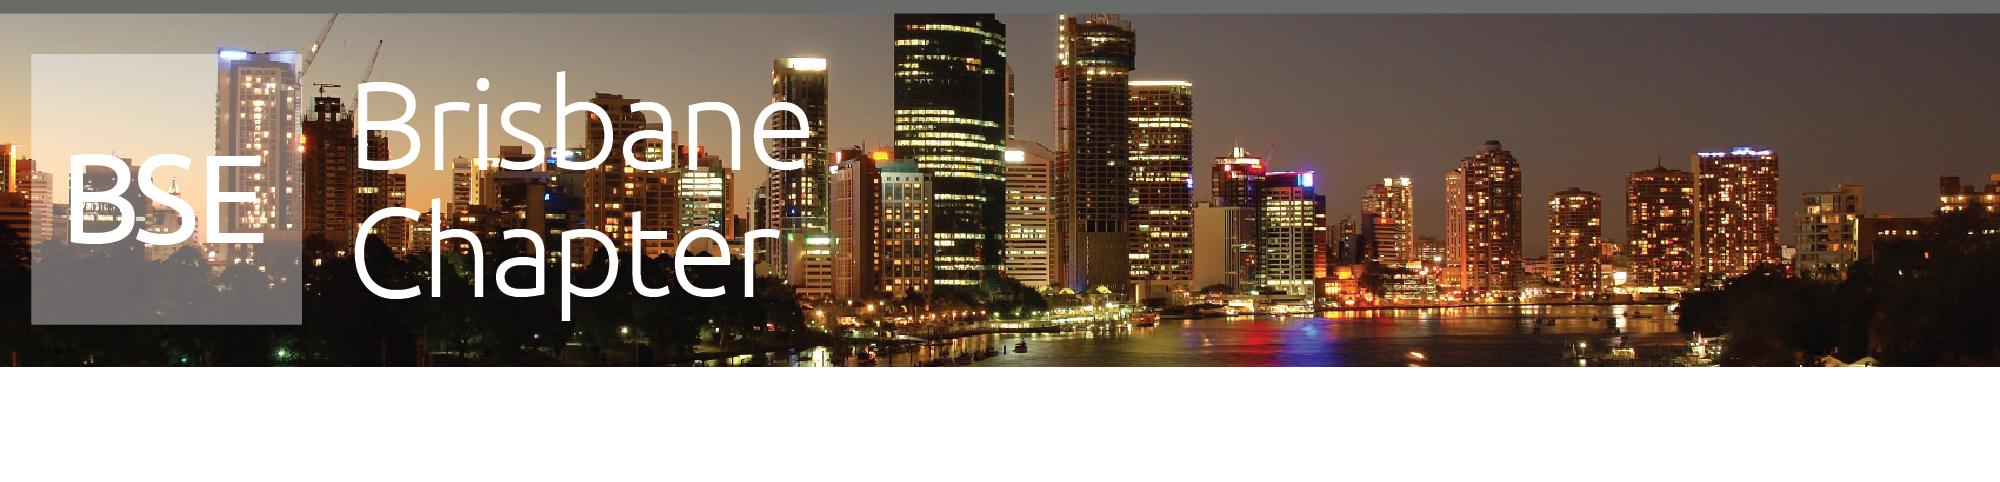 Brisbane Chapter